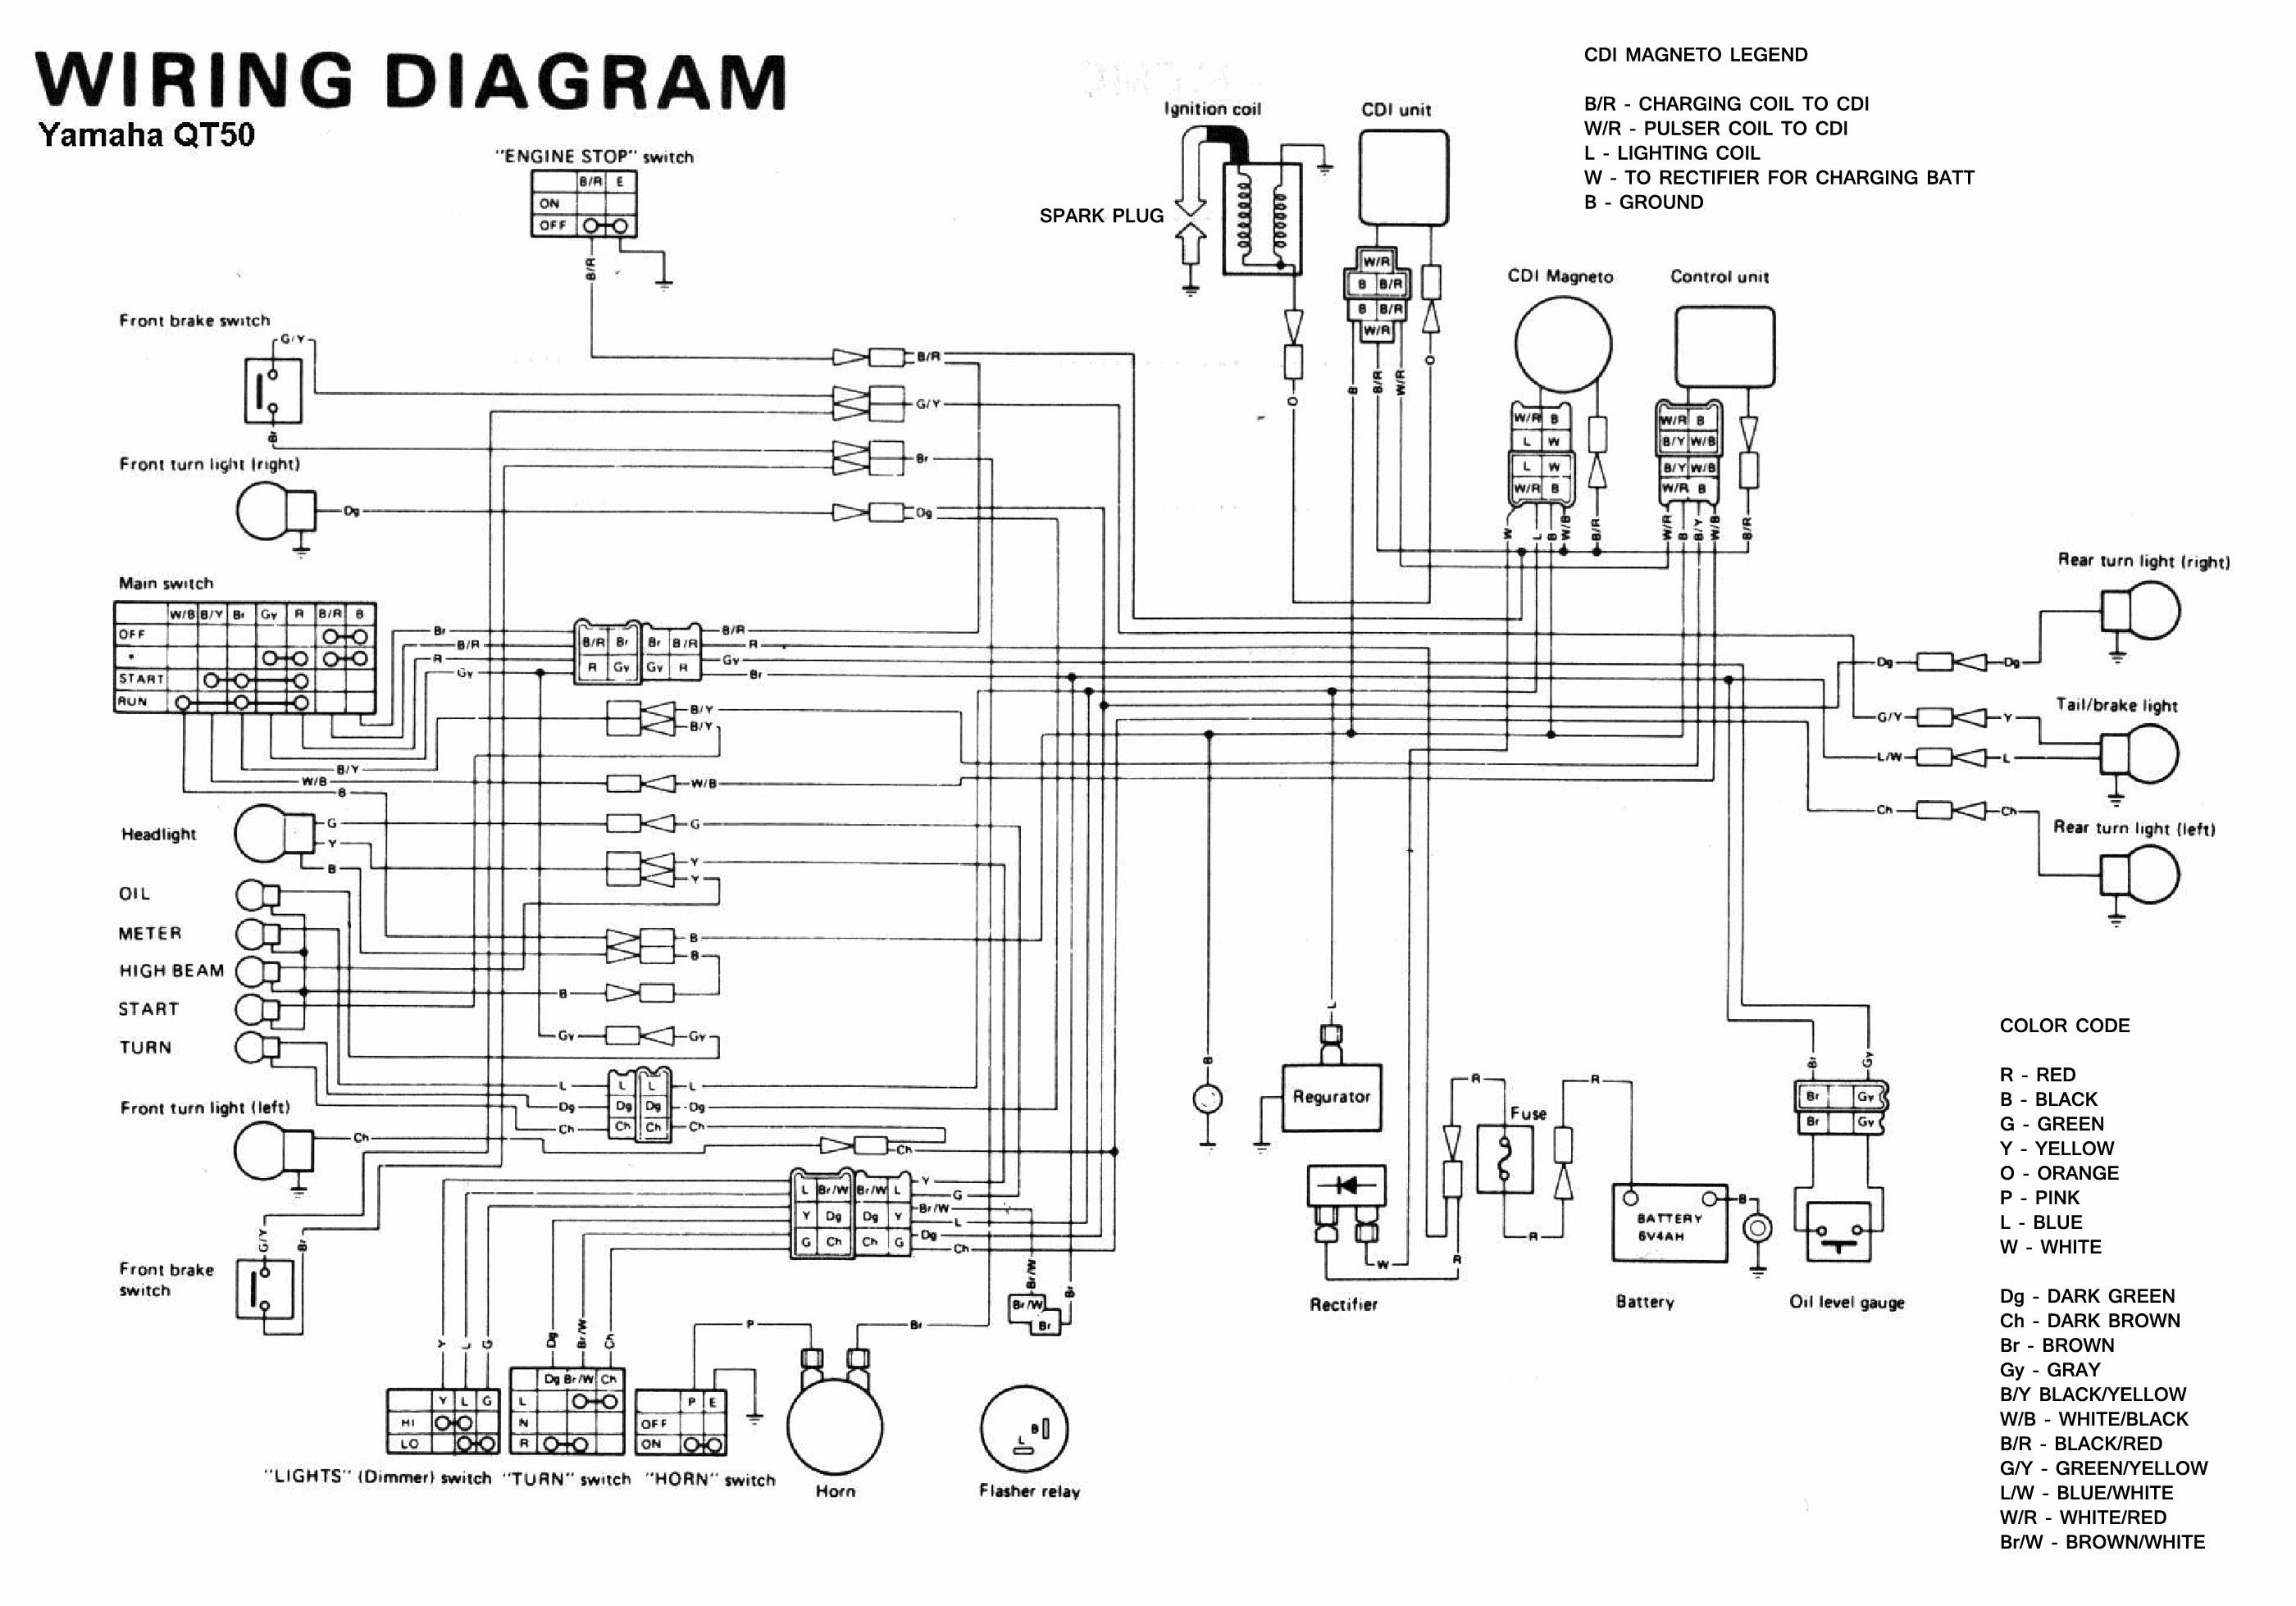 Diagram Database - Just The Best Diagram database Websiteclarke.diagramify.hosteria87.it